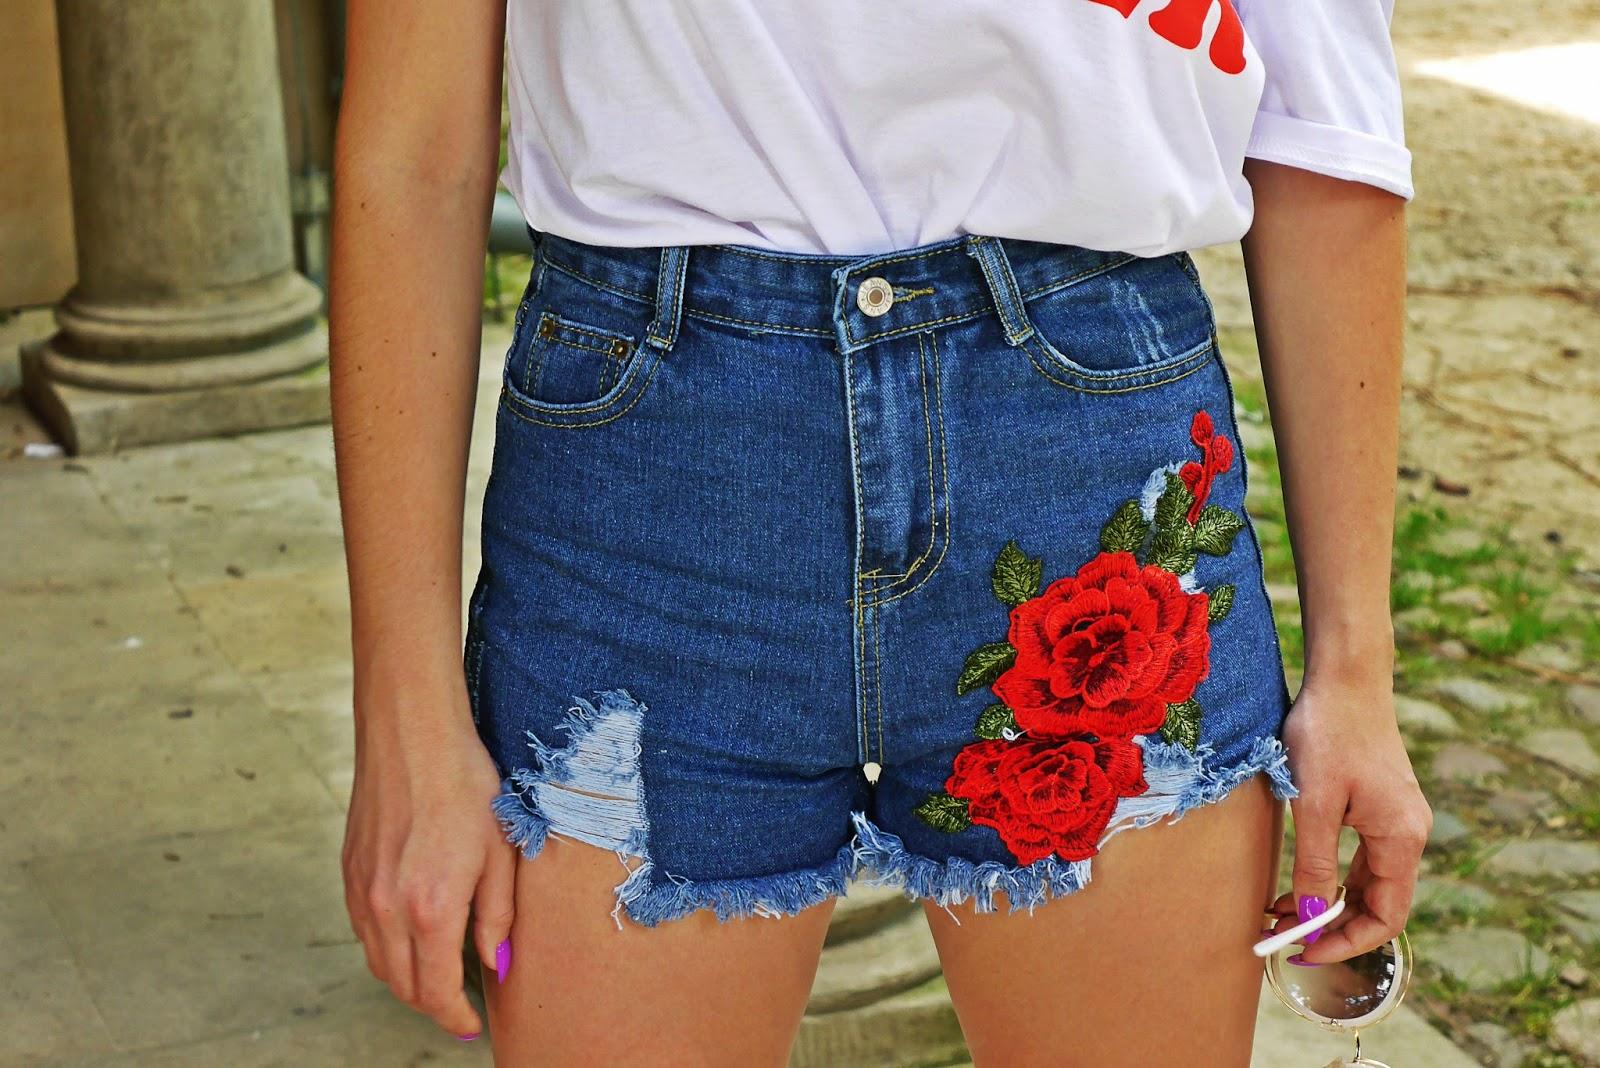 high_waist_shorts_rose_embroidery_shein_blog_modowy_karyn_130617a